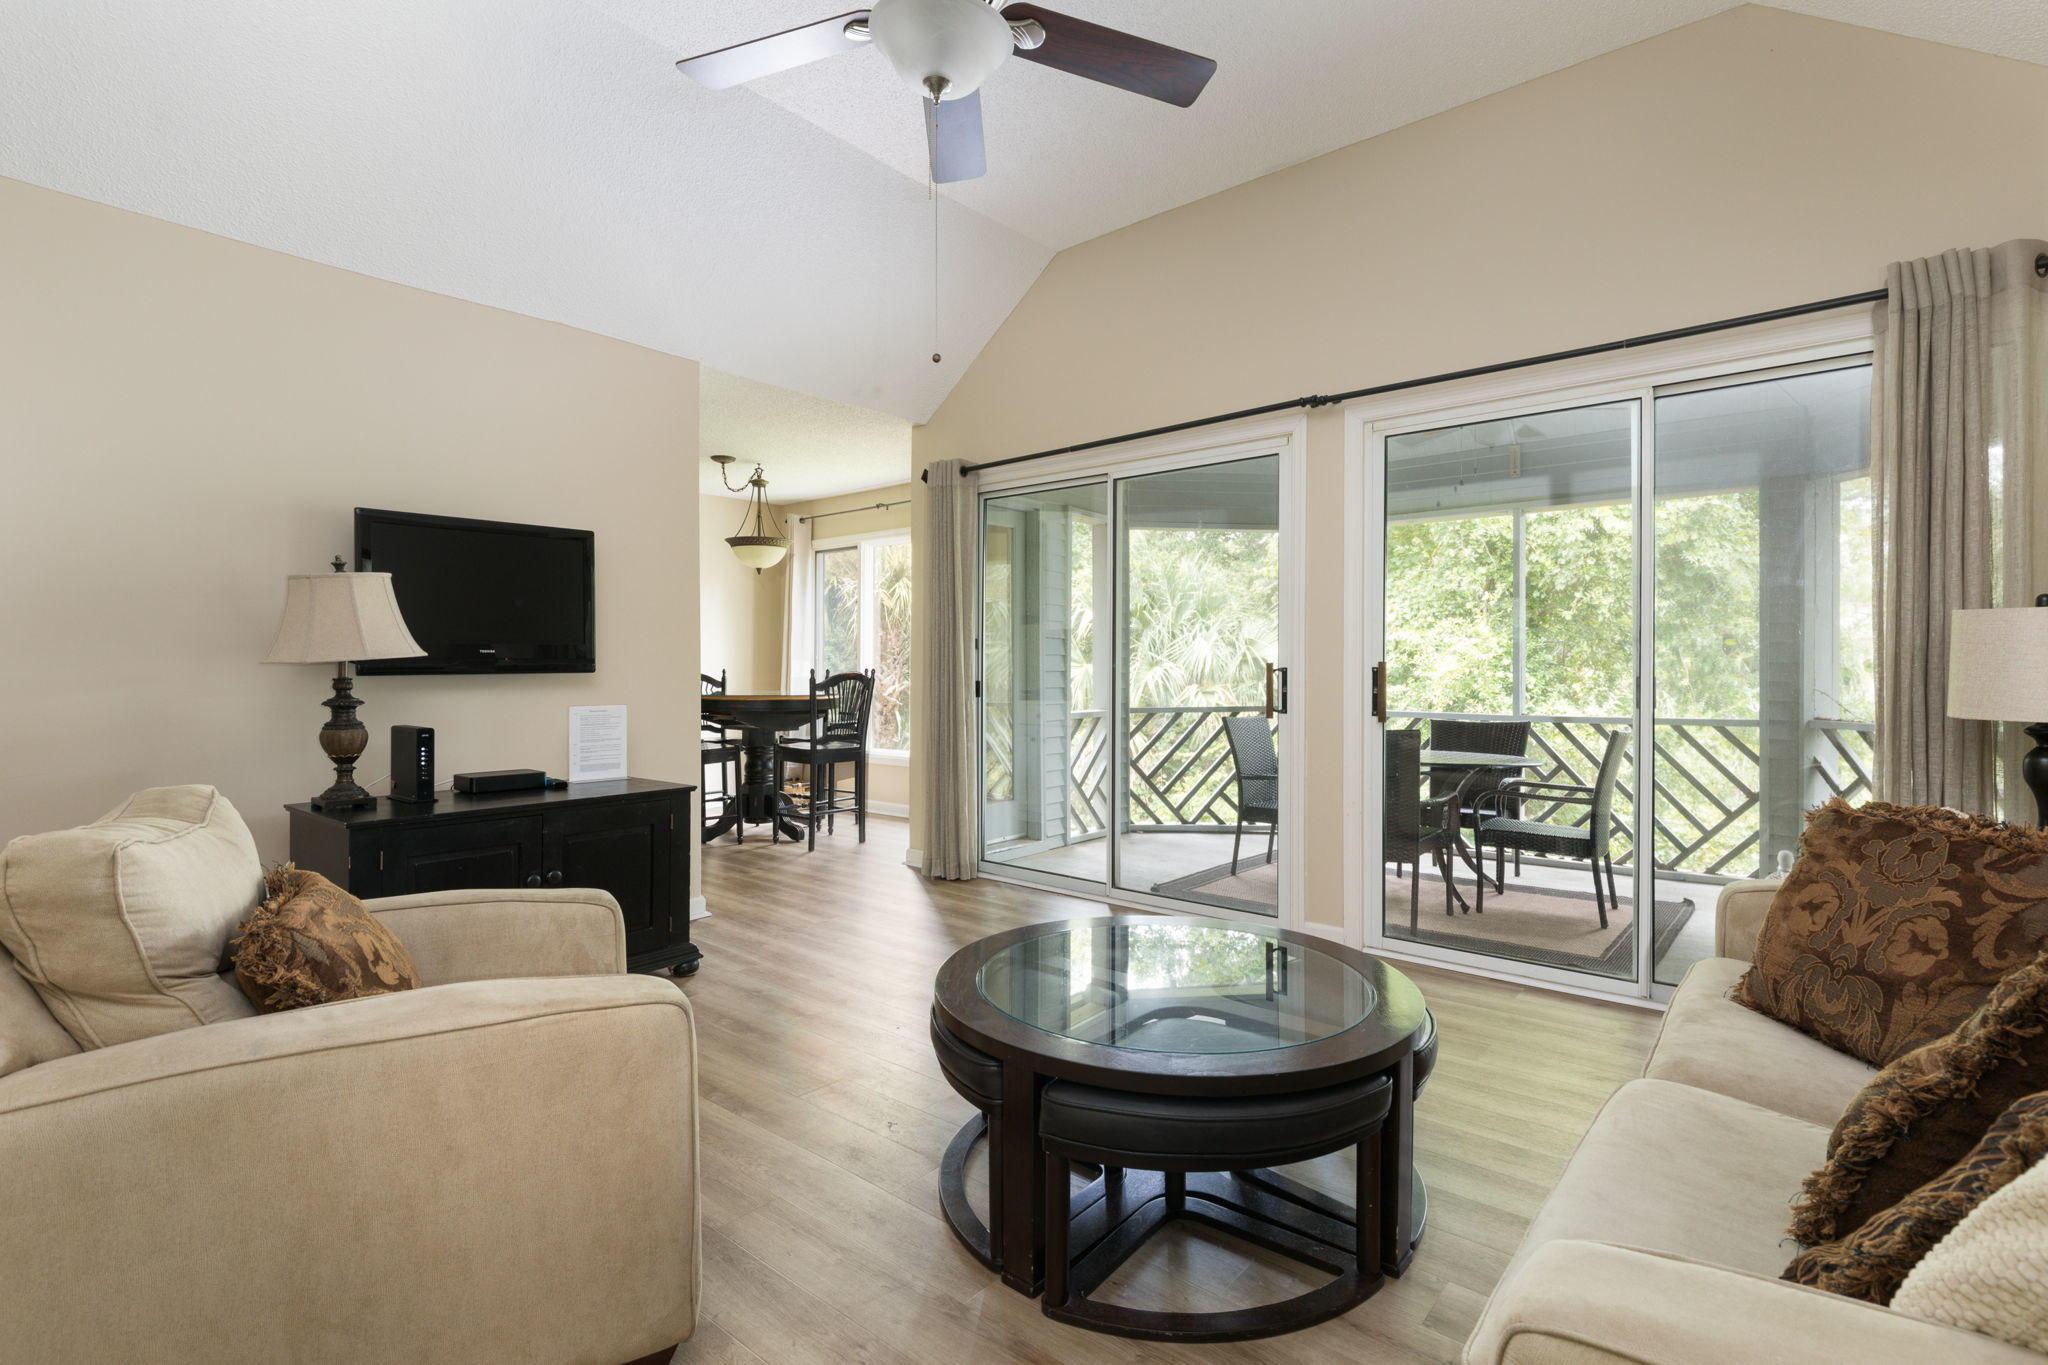 Kiawah Island Homes For Sale - 5534 Green Dolphin, Kiawah Island, SC - 41